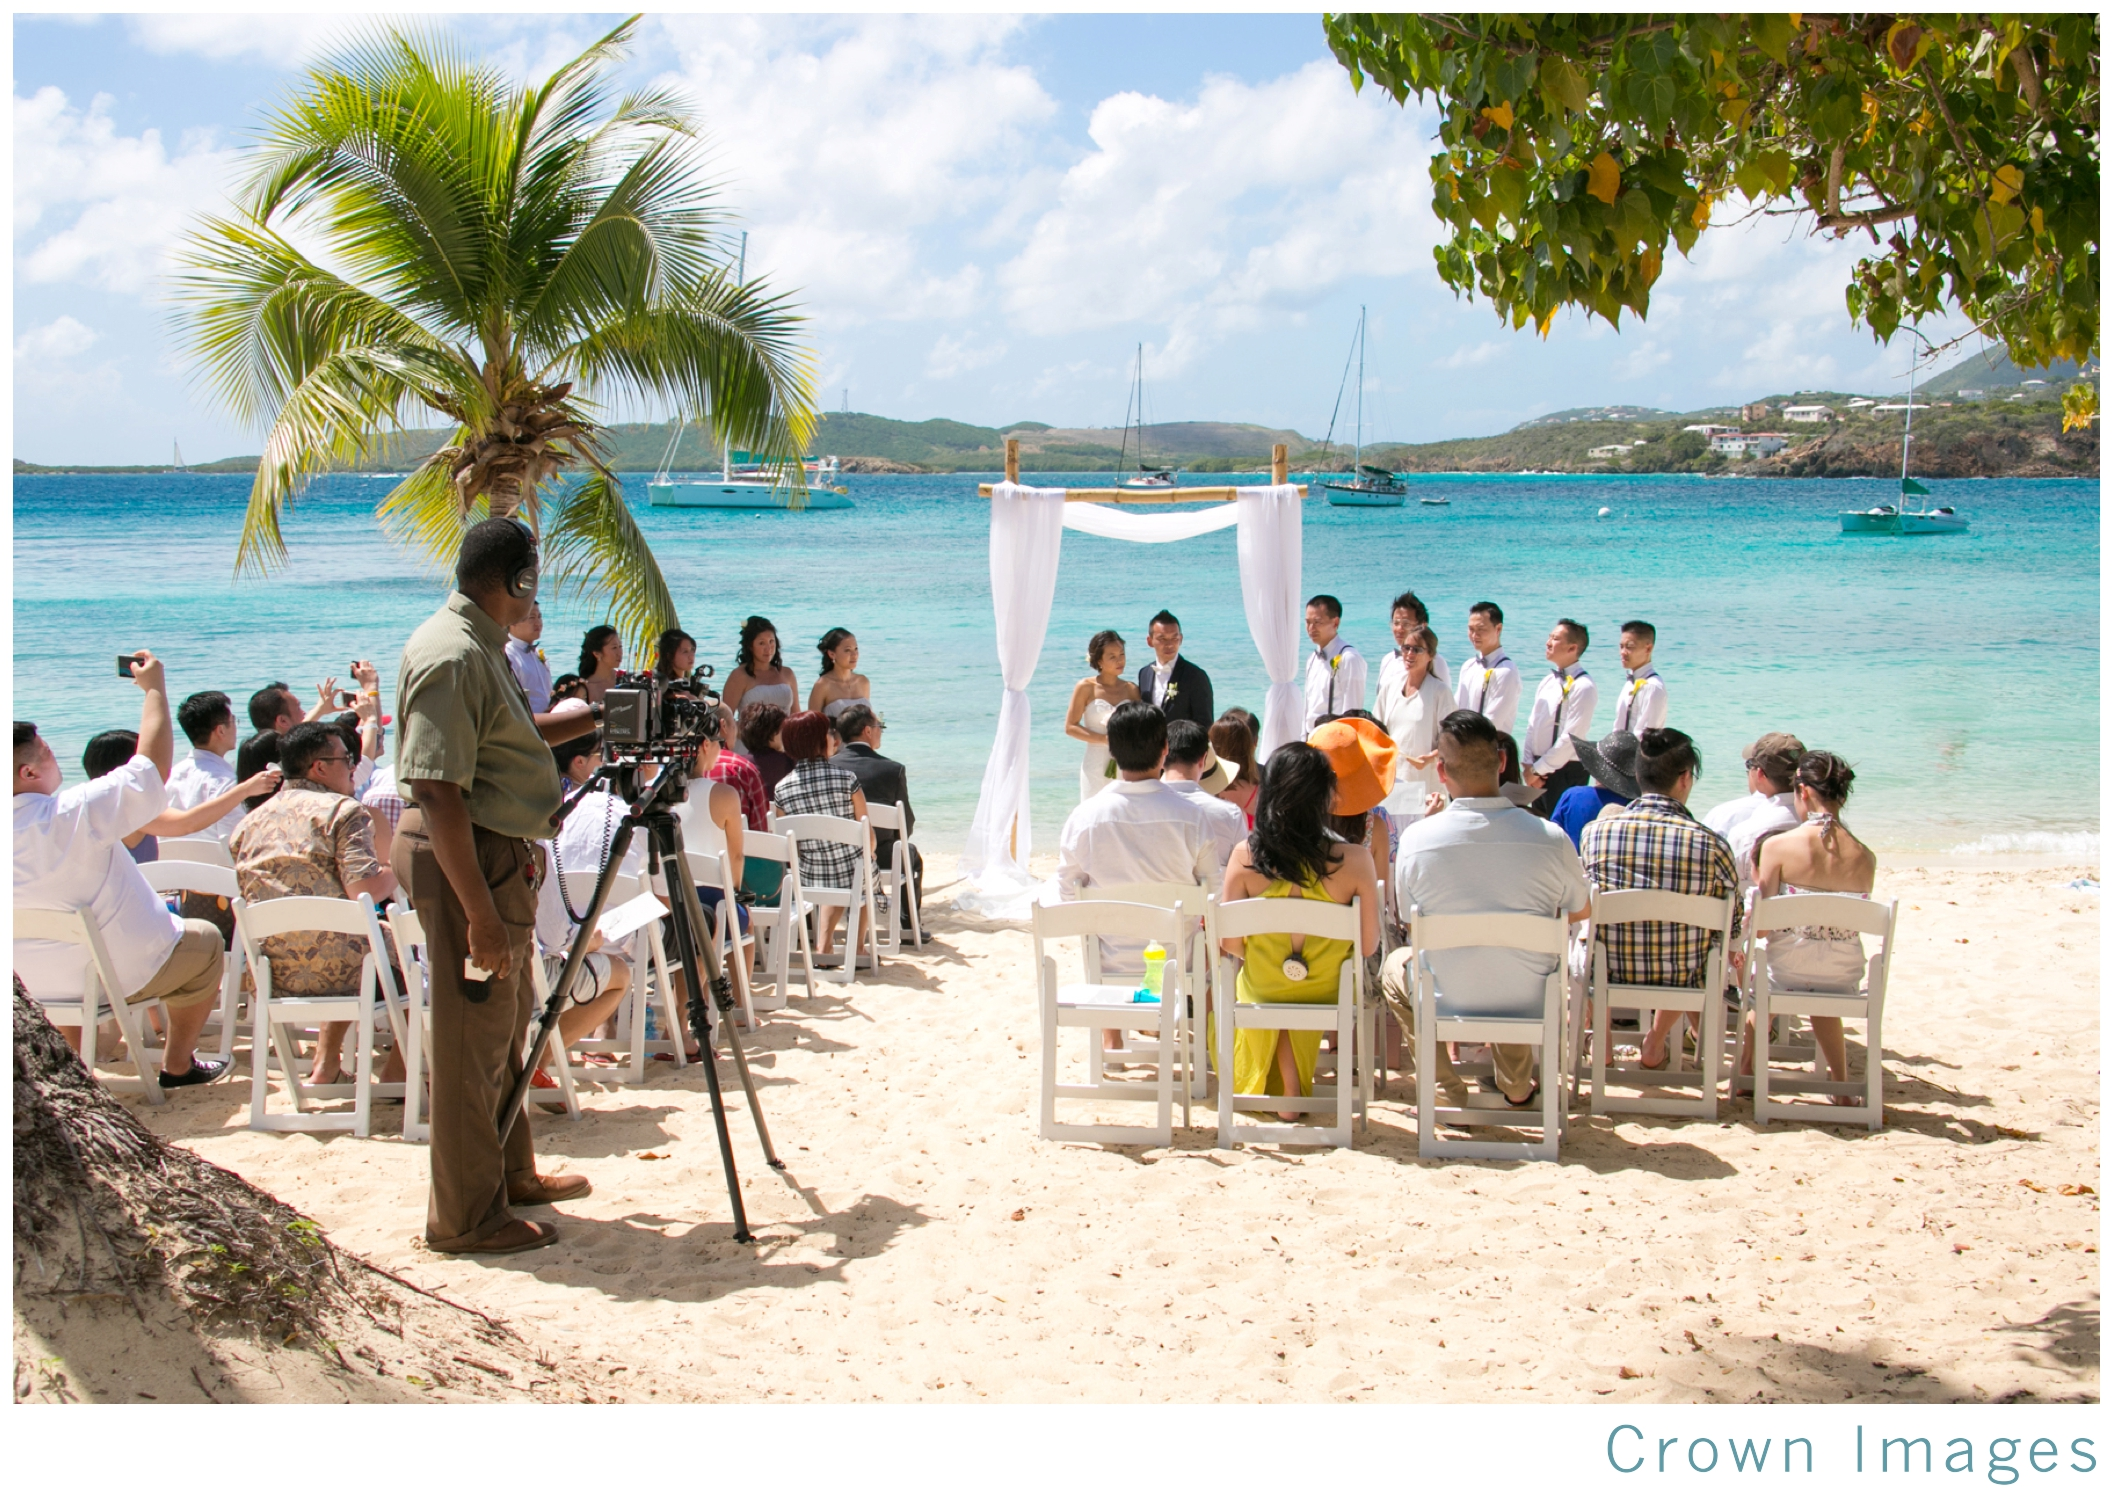 st_thomas_wedding_photographer_0799.jpg